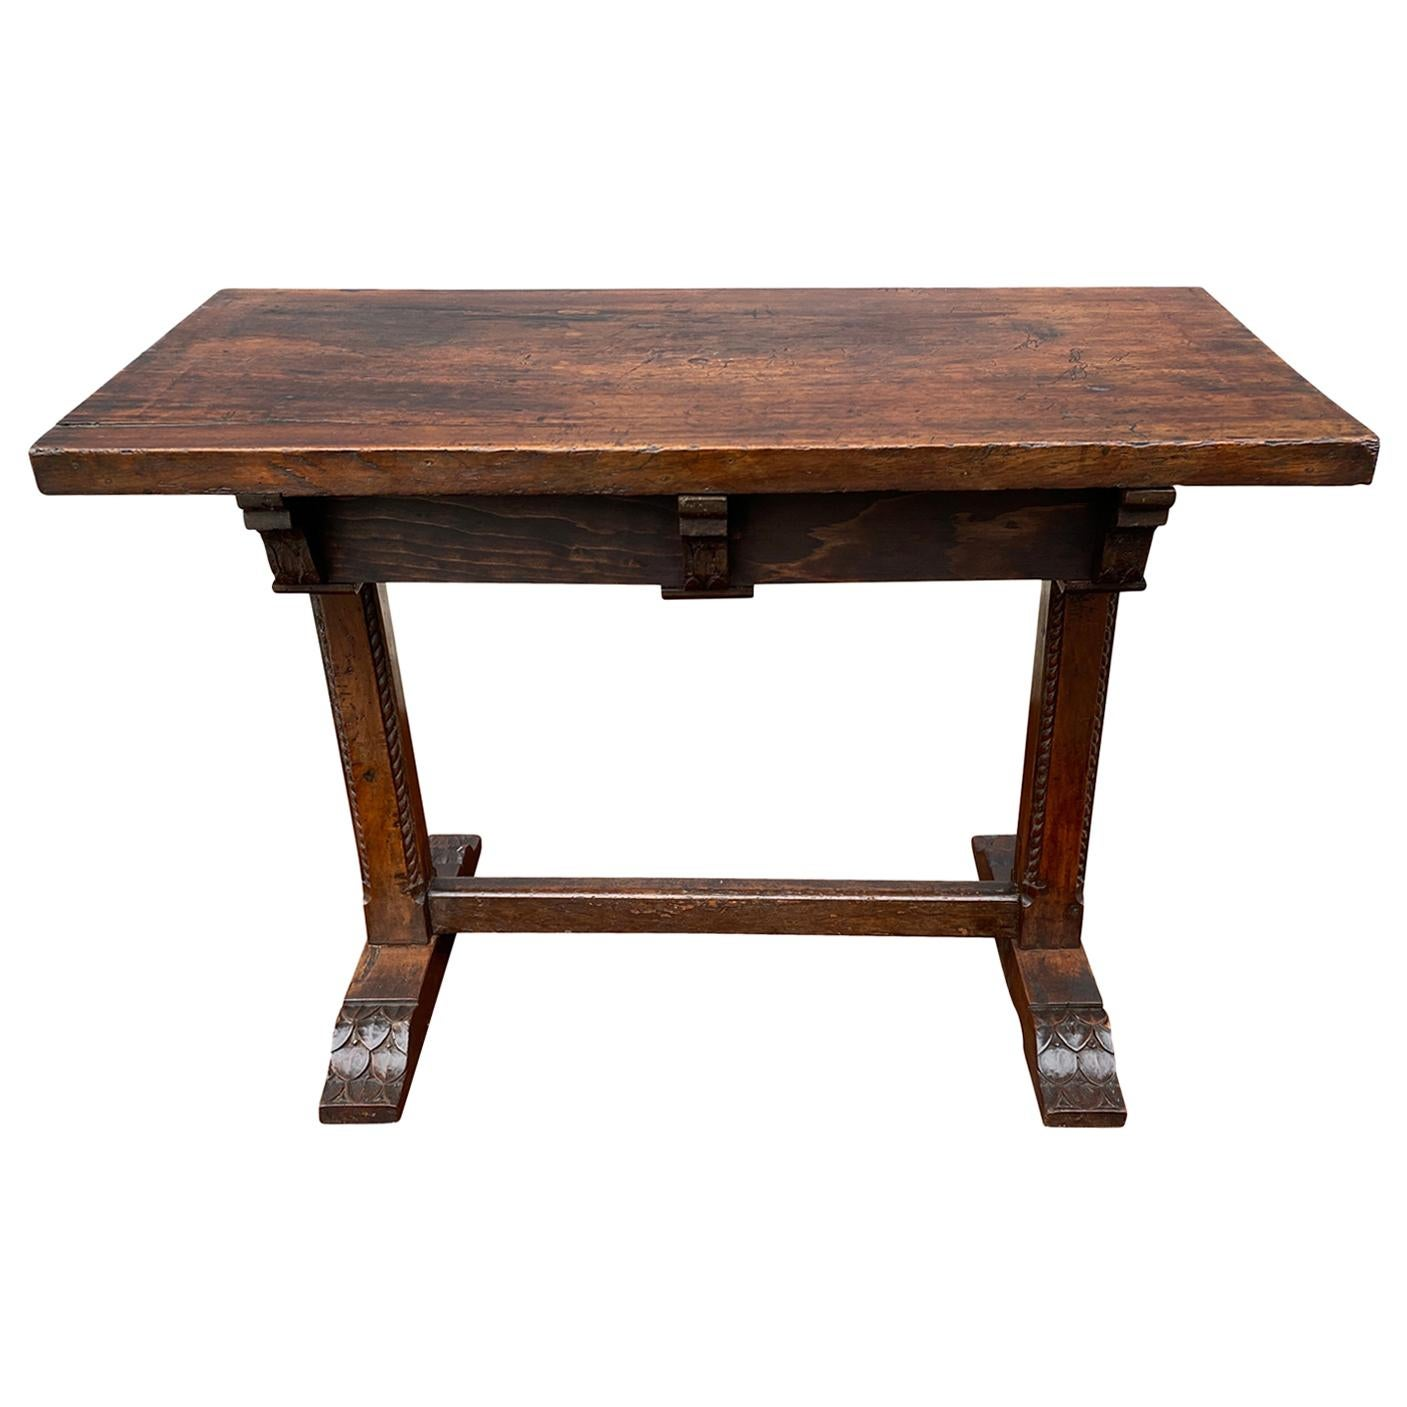 17th Century Spanish Walnut Trestle Table